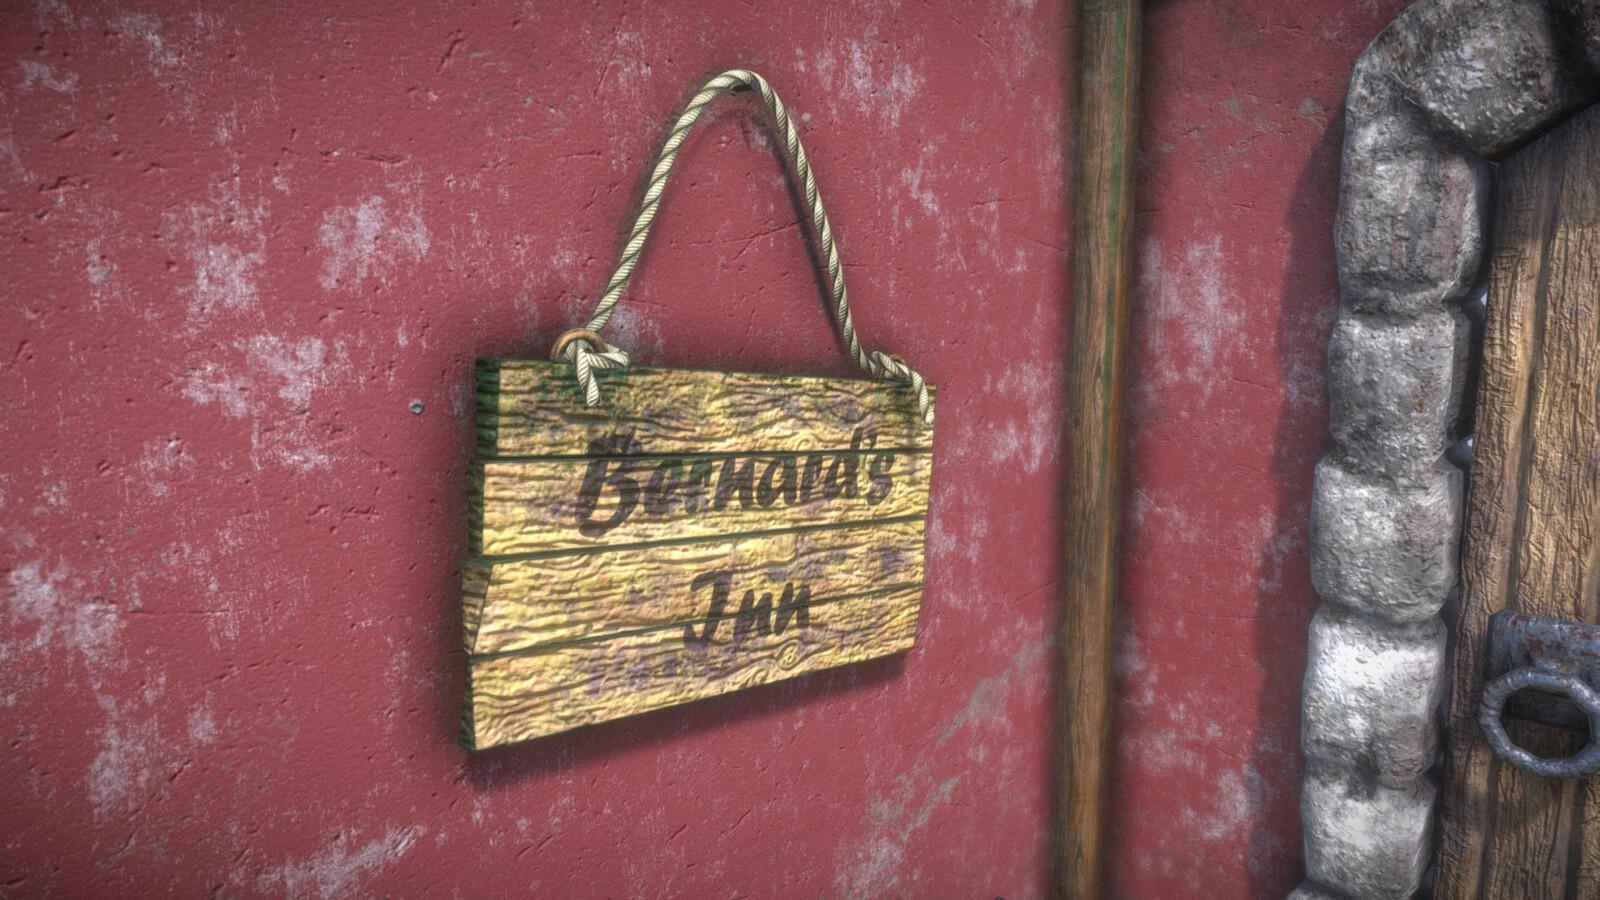 Bernard's Inn Sign (Day).